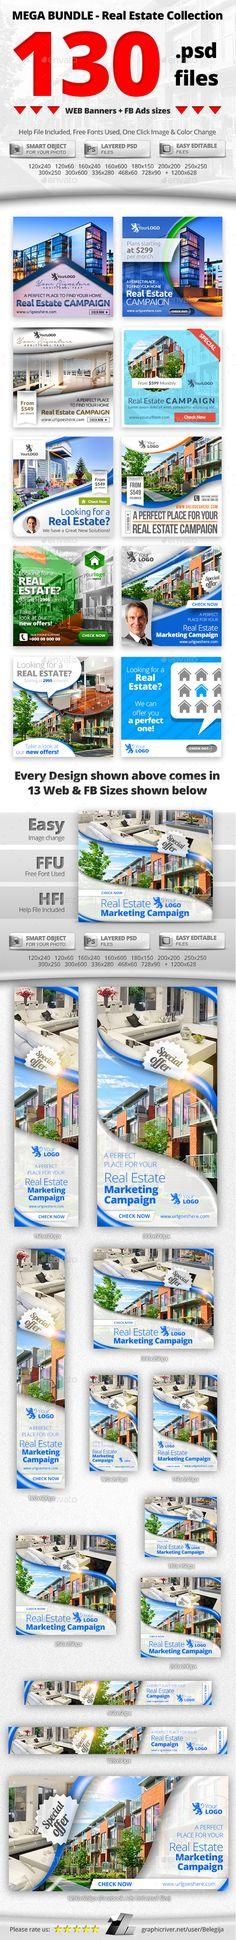 10 in 1 Real Estate Web & FB Banners - Mega Bundle 2 - Banners & Ads Web Elements Download here : https://graphicriver.net/item/10-in-1-real-estate-web-fb-banners-mega-bundle-2/19578503?s_rank=86&ref=Al-fatih